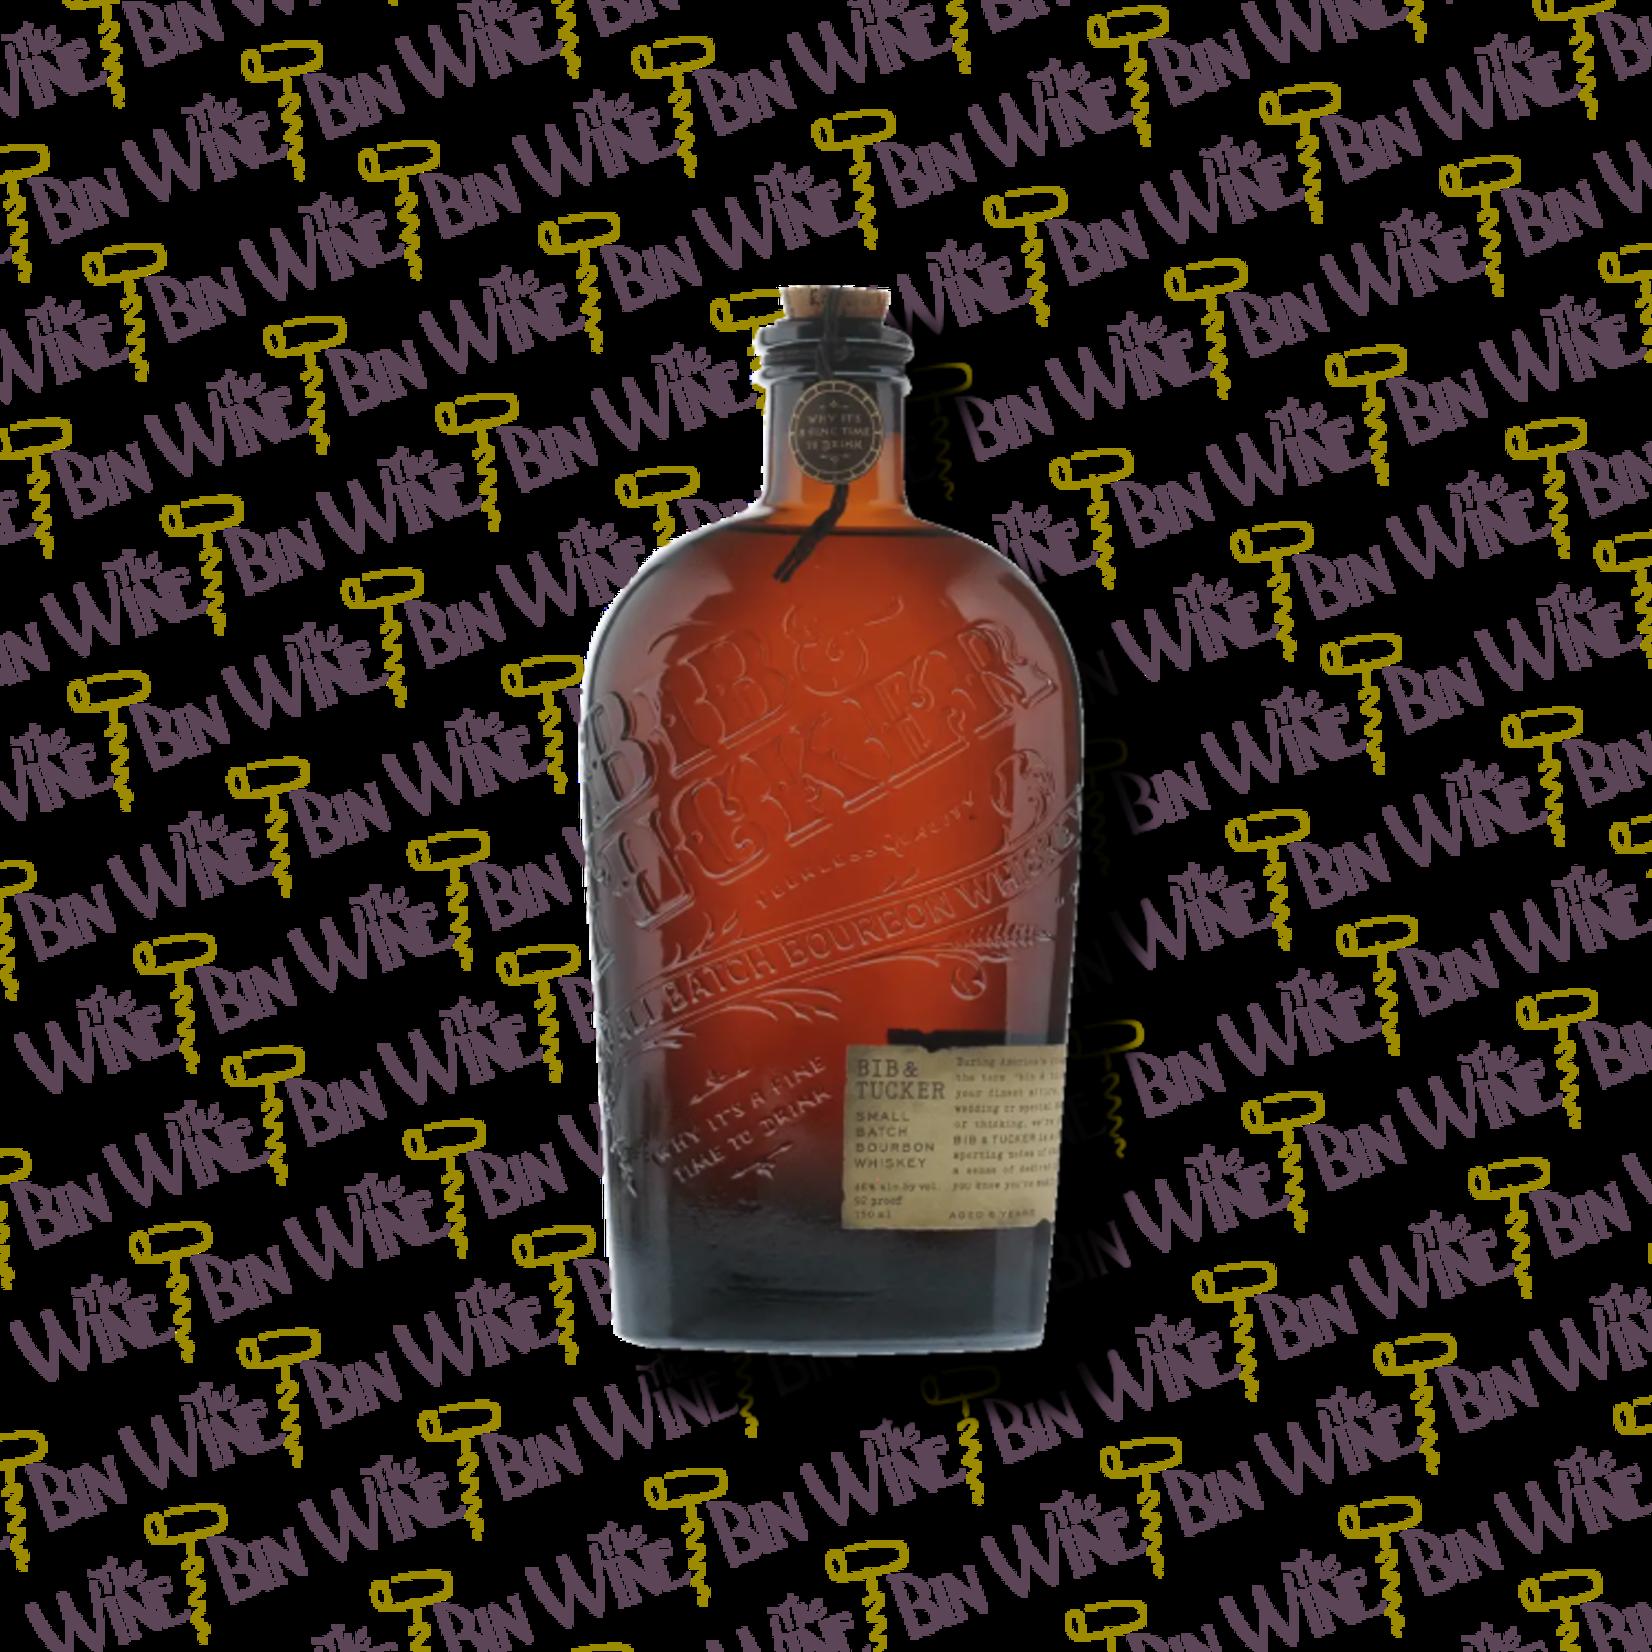 Bib & Tucker Bib & Tucker Bourbon 750ml